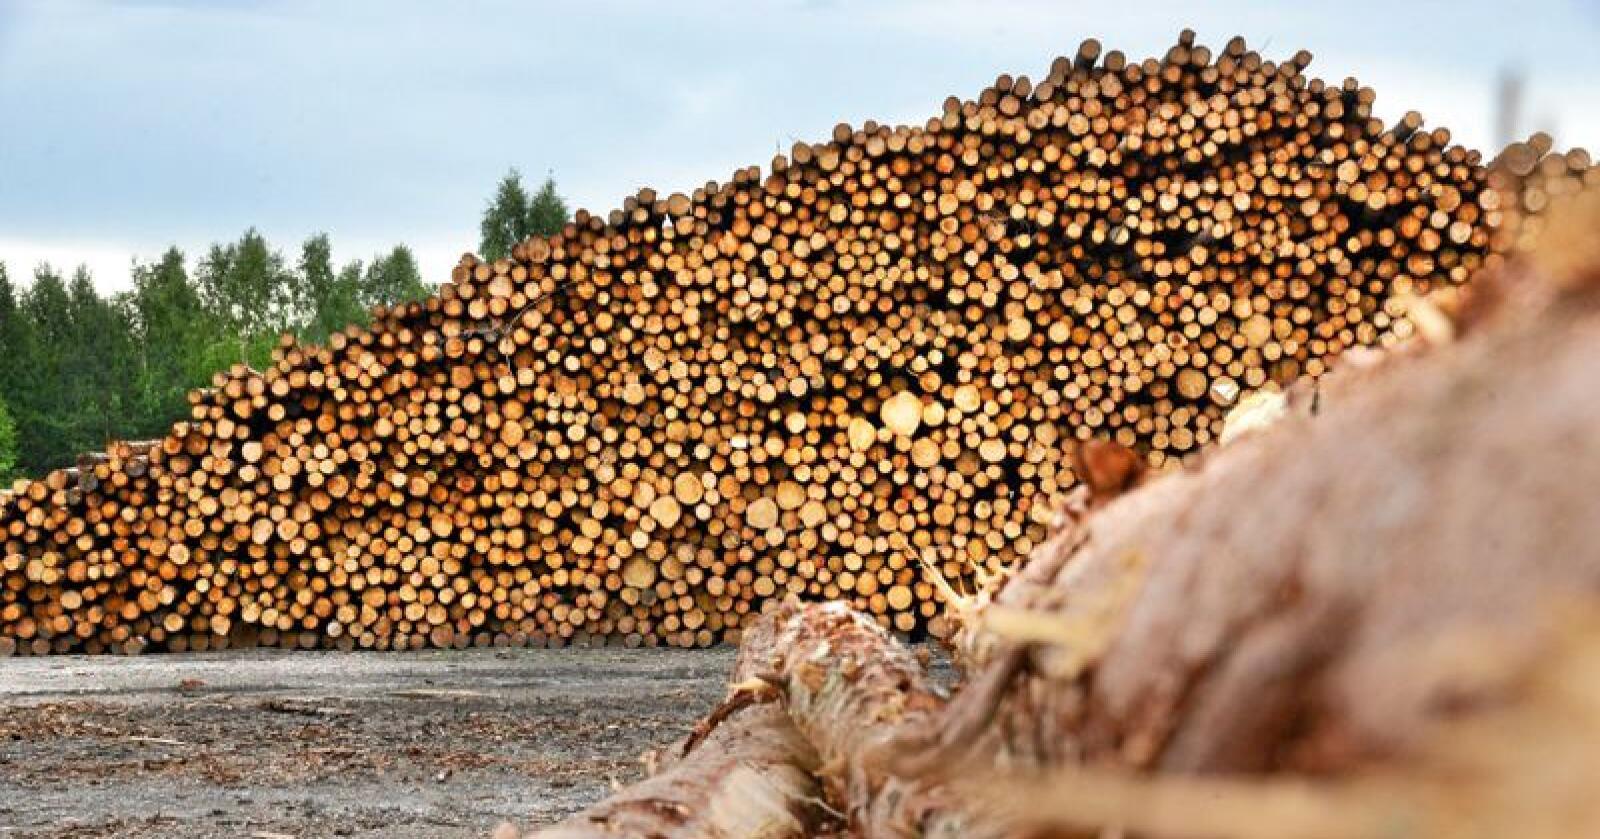 Tømmertransport handler om store volumer, skriver Line Venn. Foto: Siri Juell Rasmussen